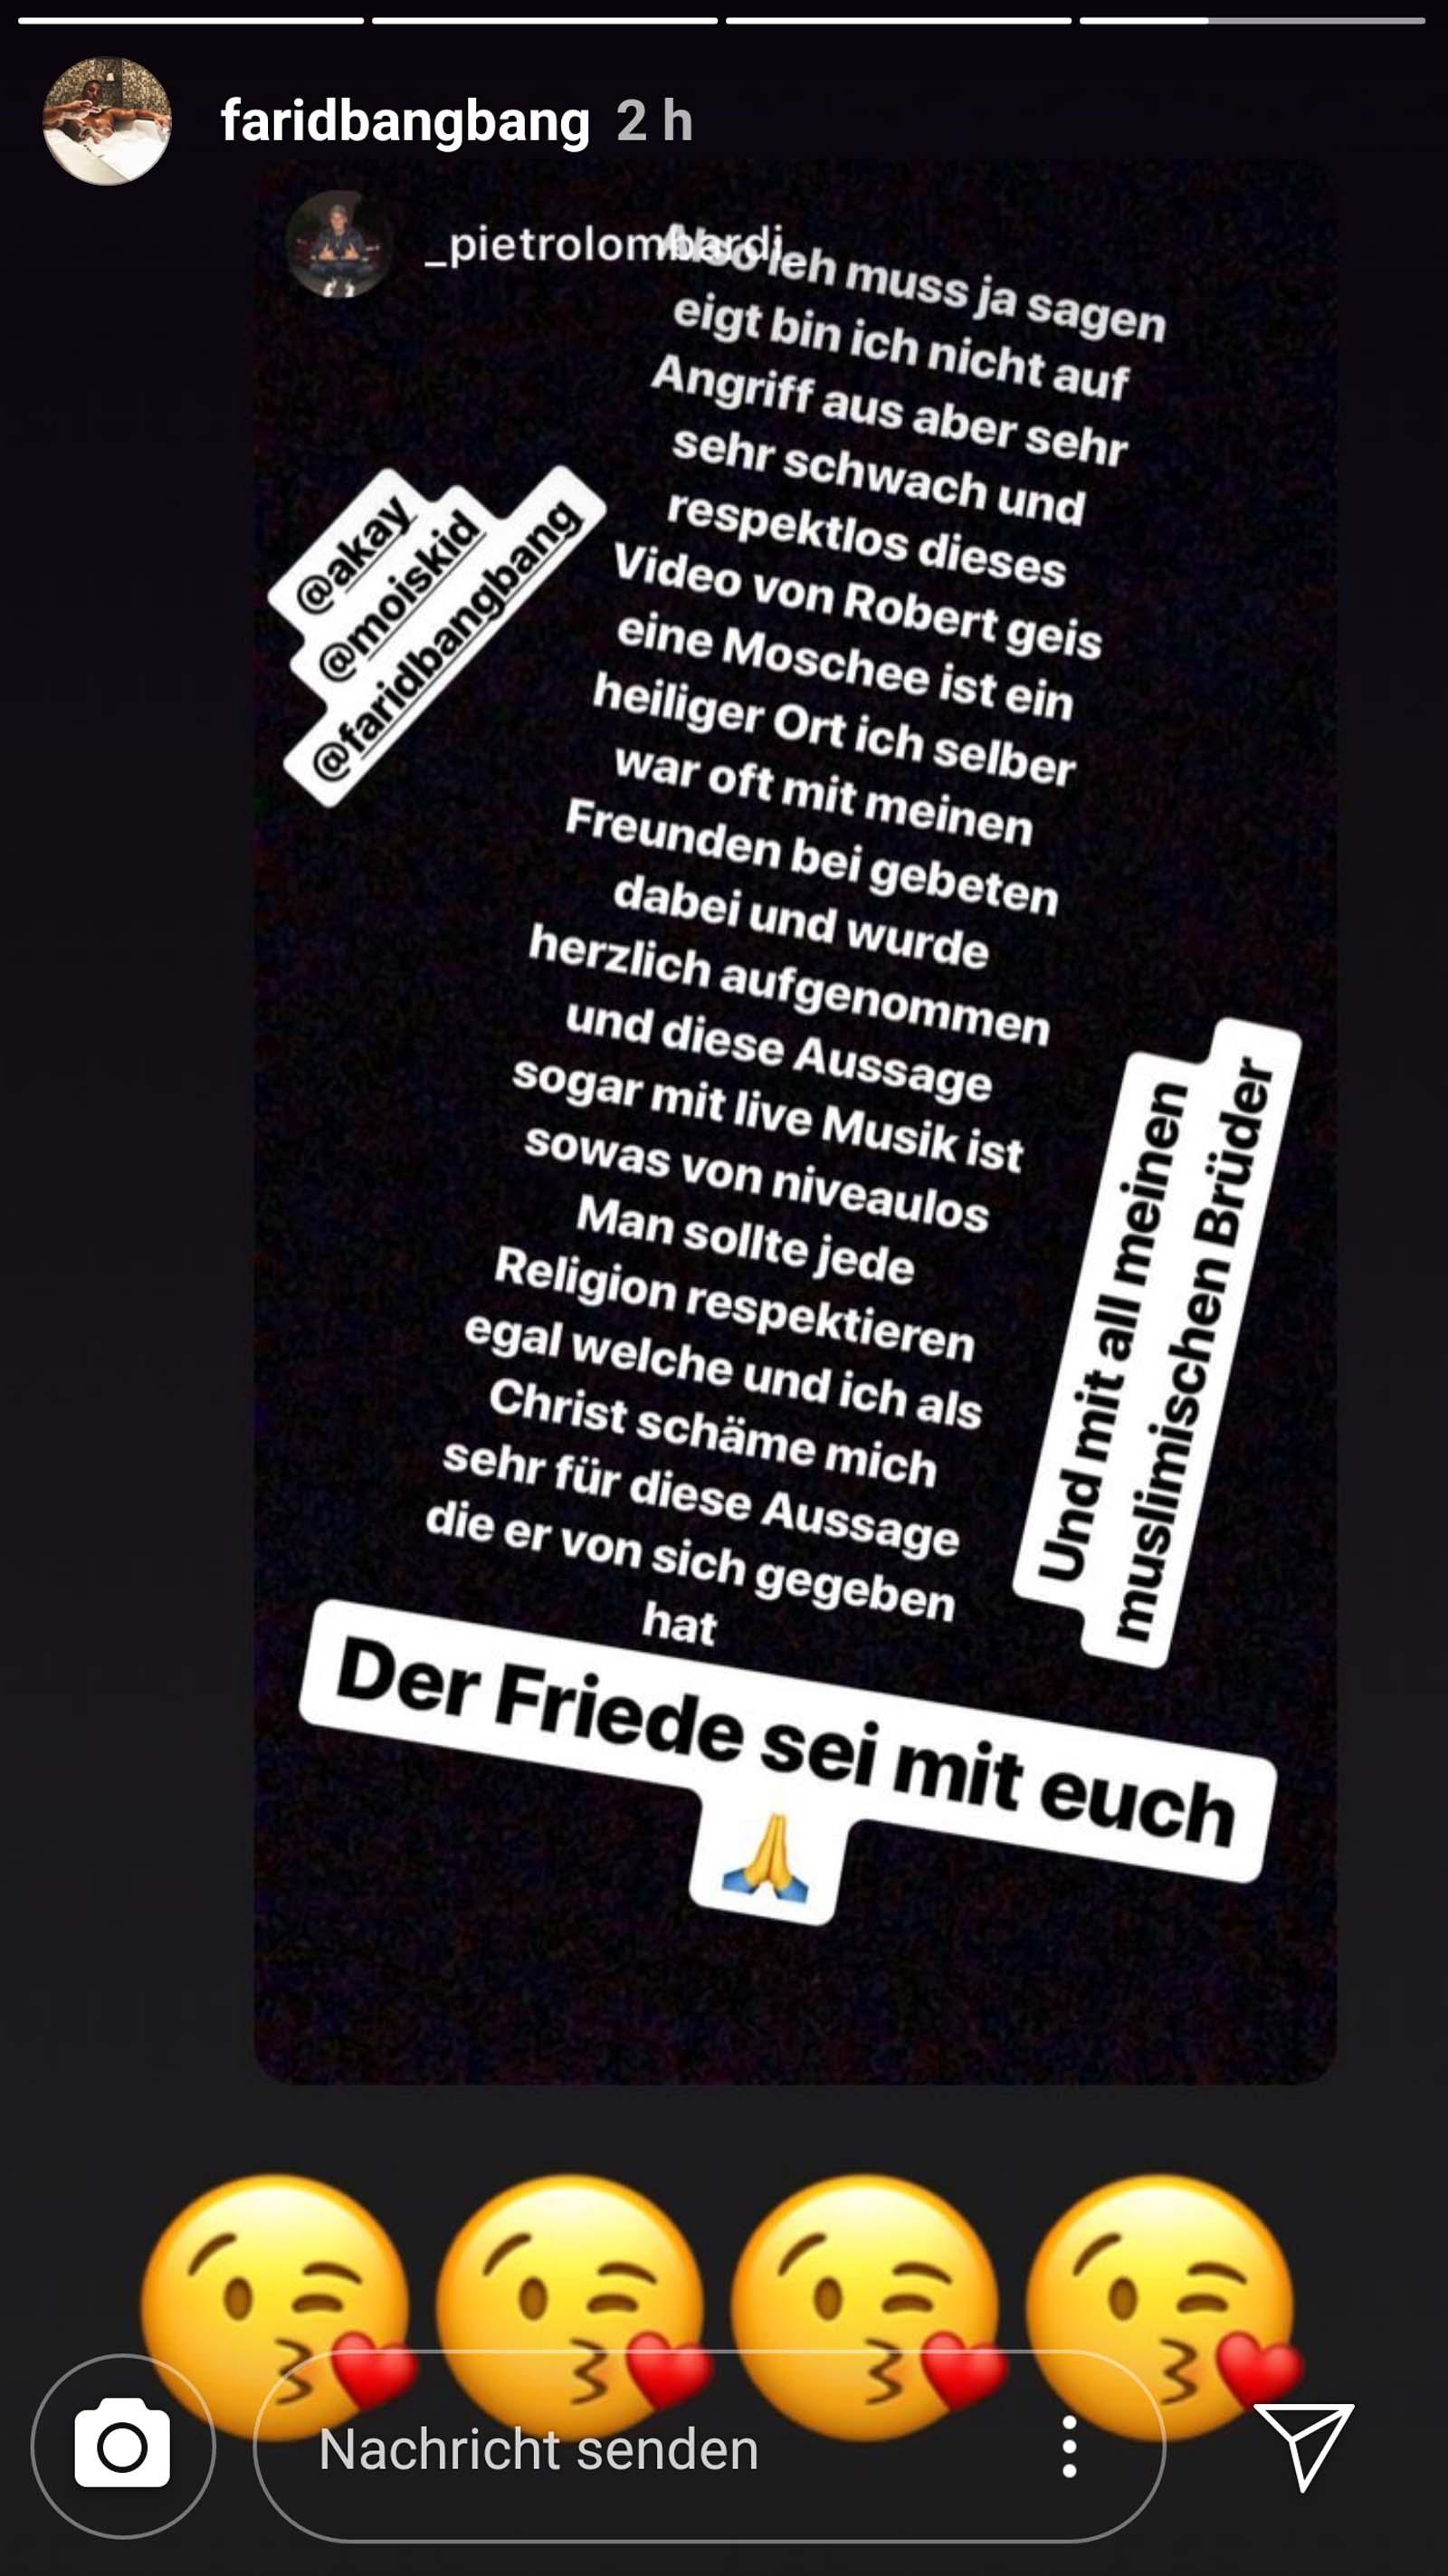 Farid Bang postet Statement von Pietro Lombardi